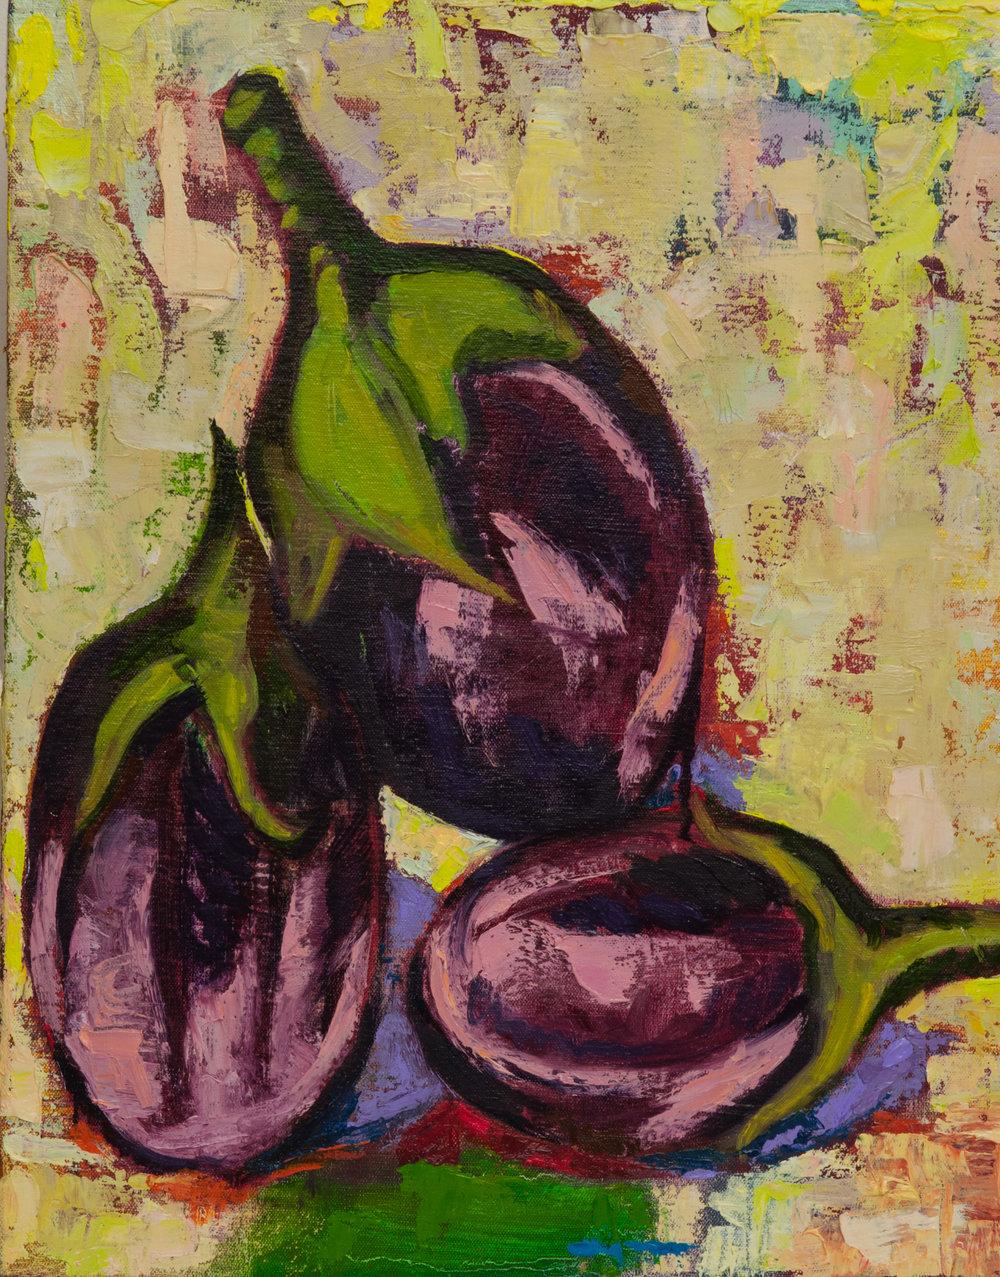 3 Small Eggplants